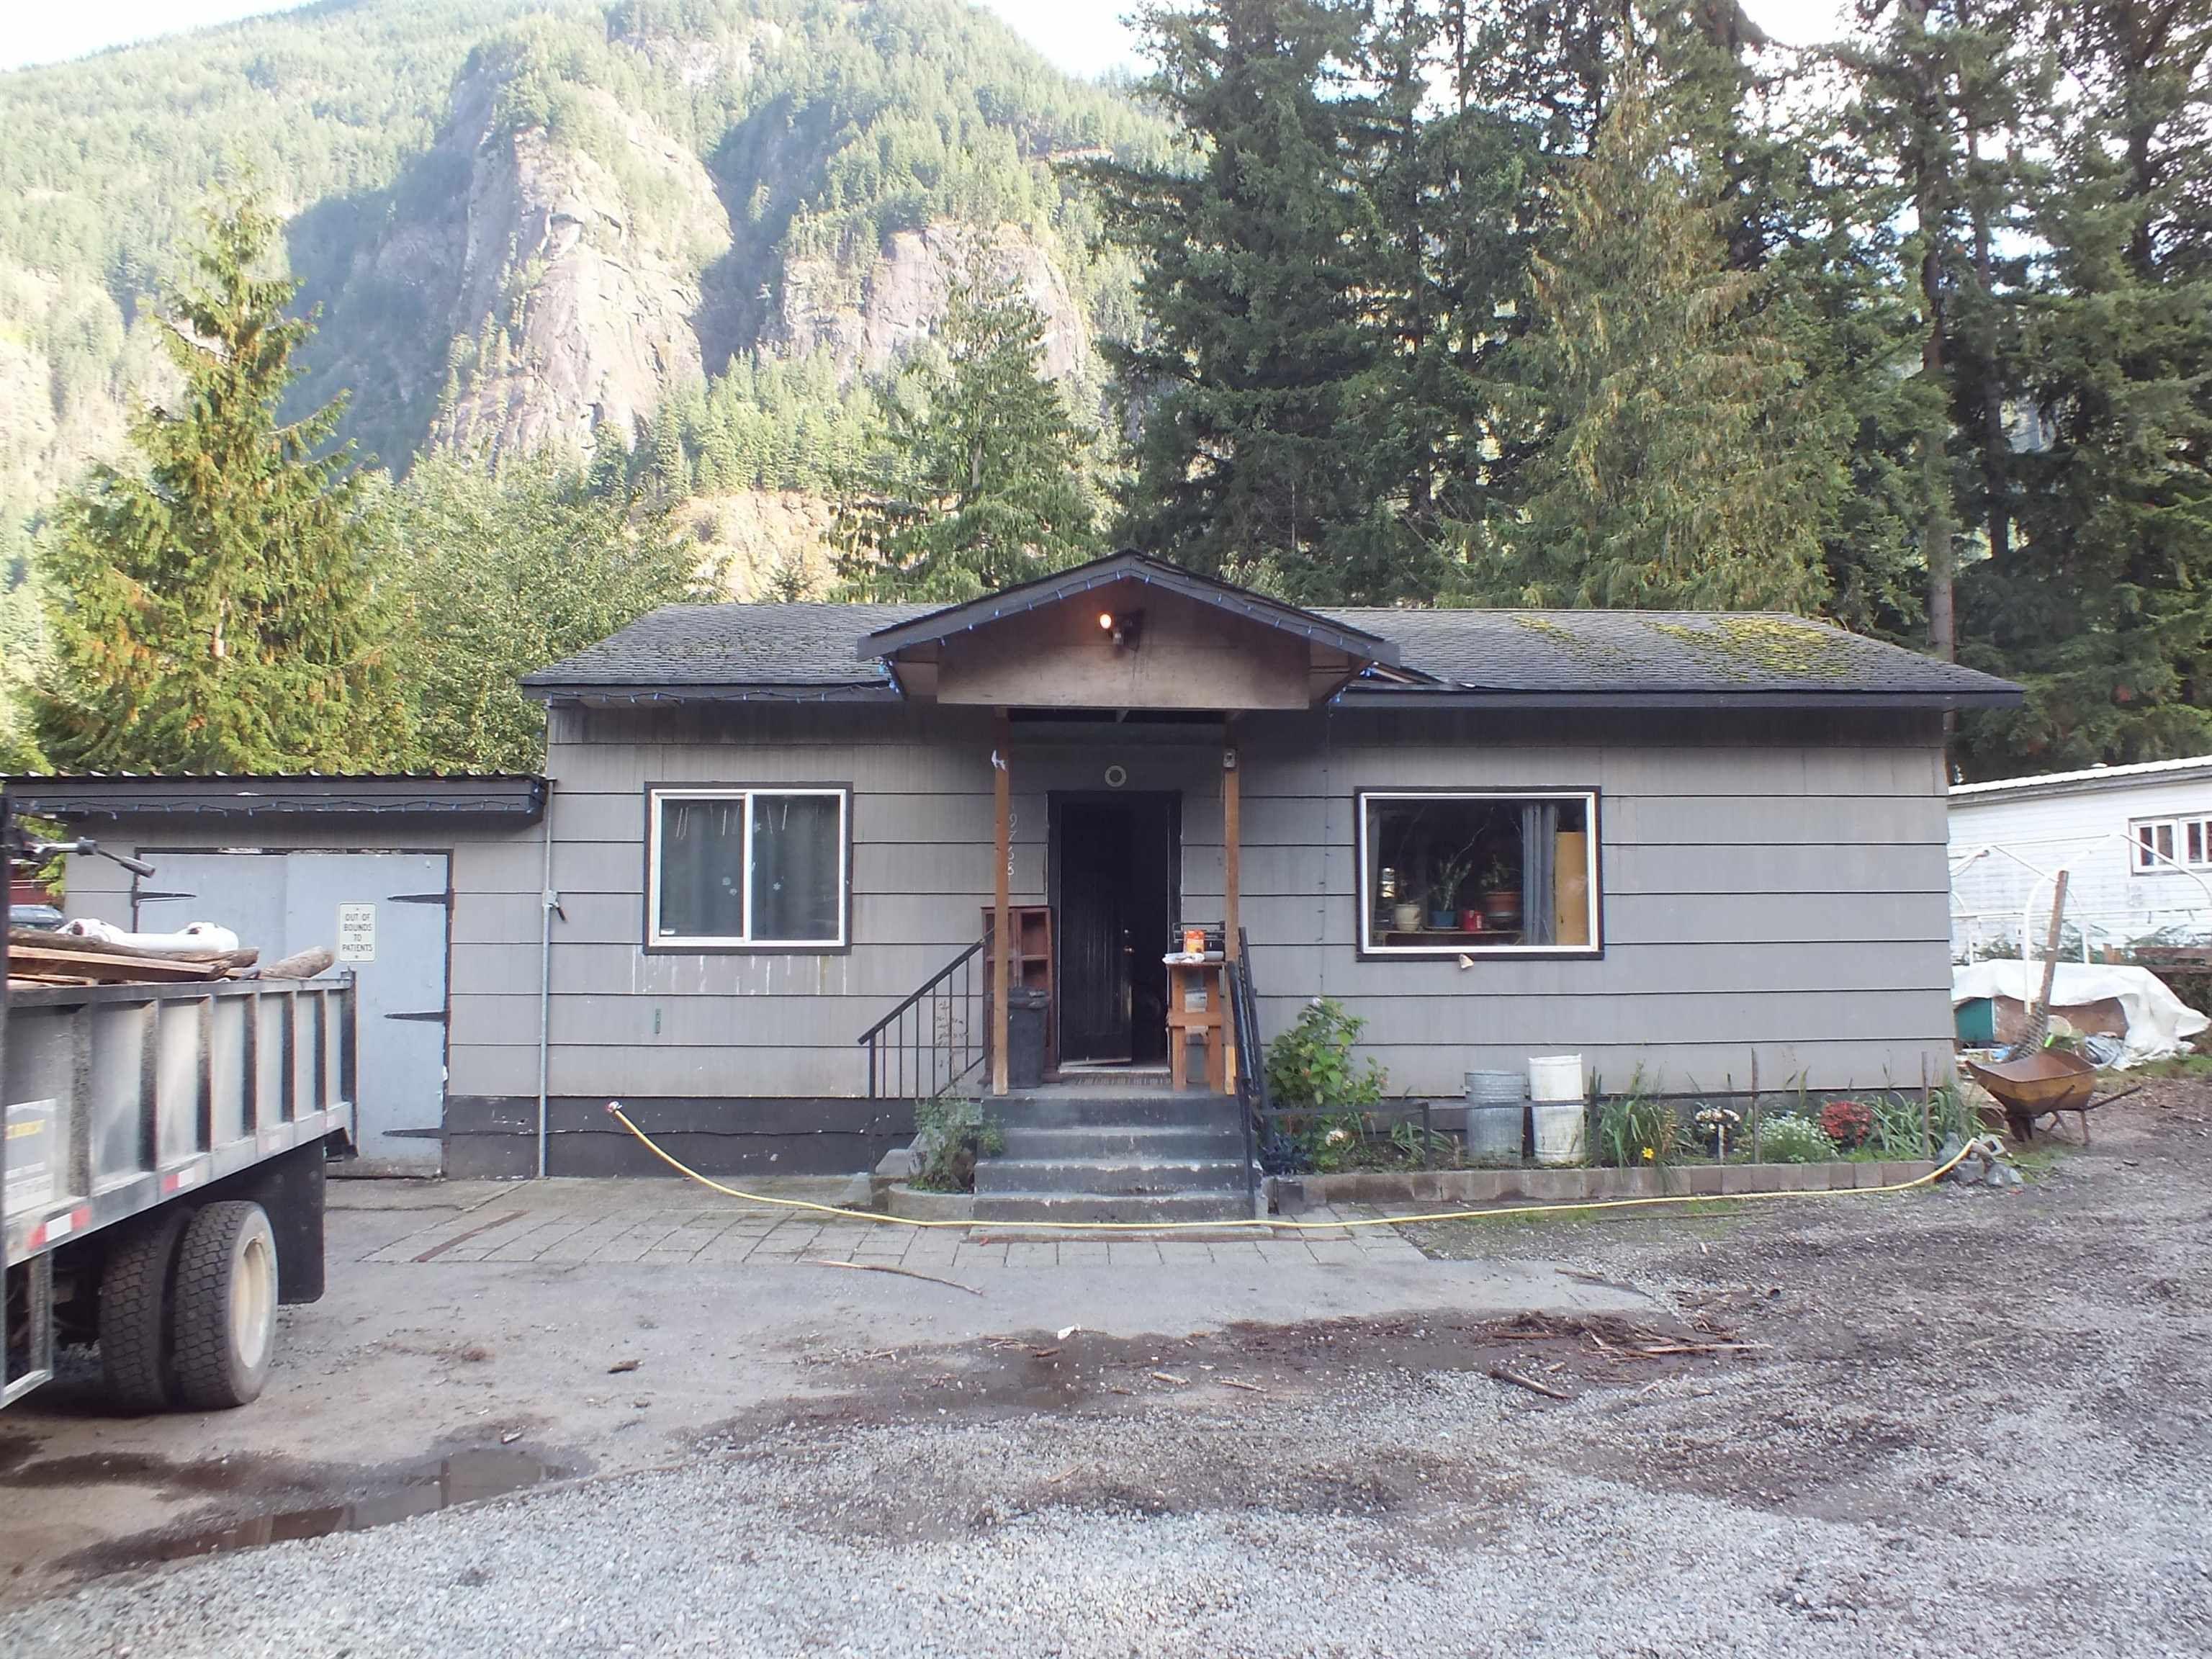 Main Photo: 19768 SILVERHOPE Road in Hope: Hope Silver Creek House for sale : MLS®# R2618307